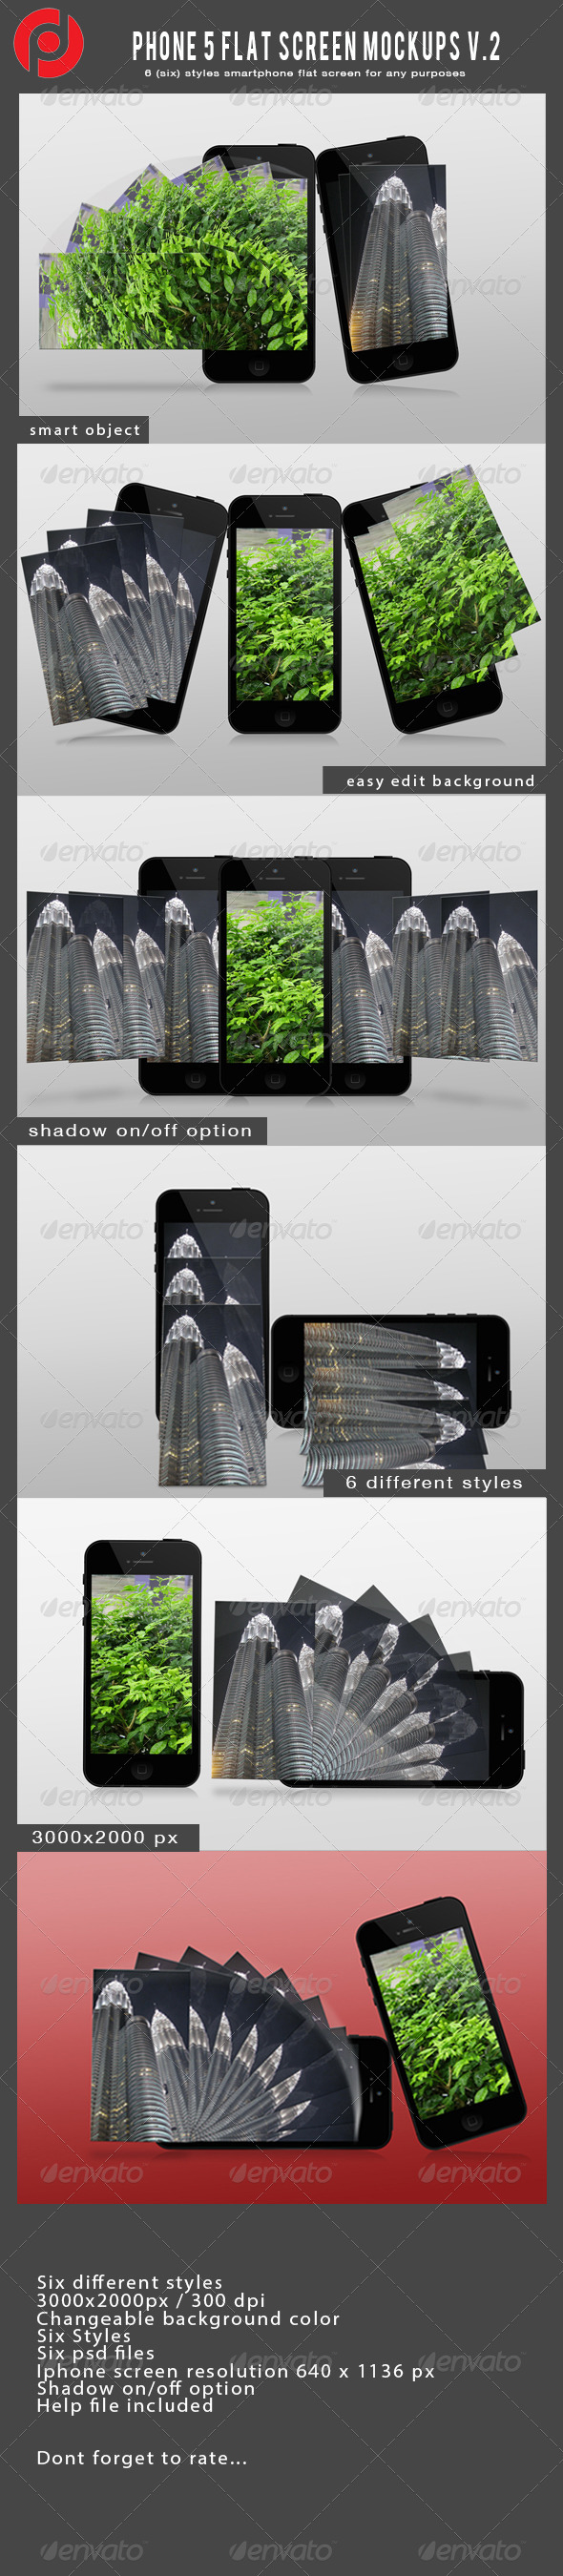 Phone 5 flat screen mockups